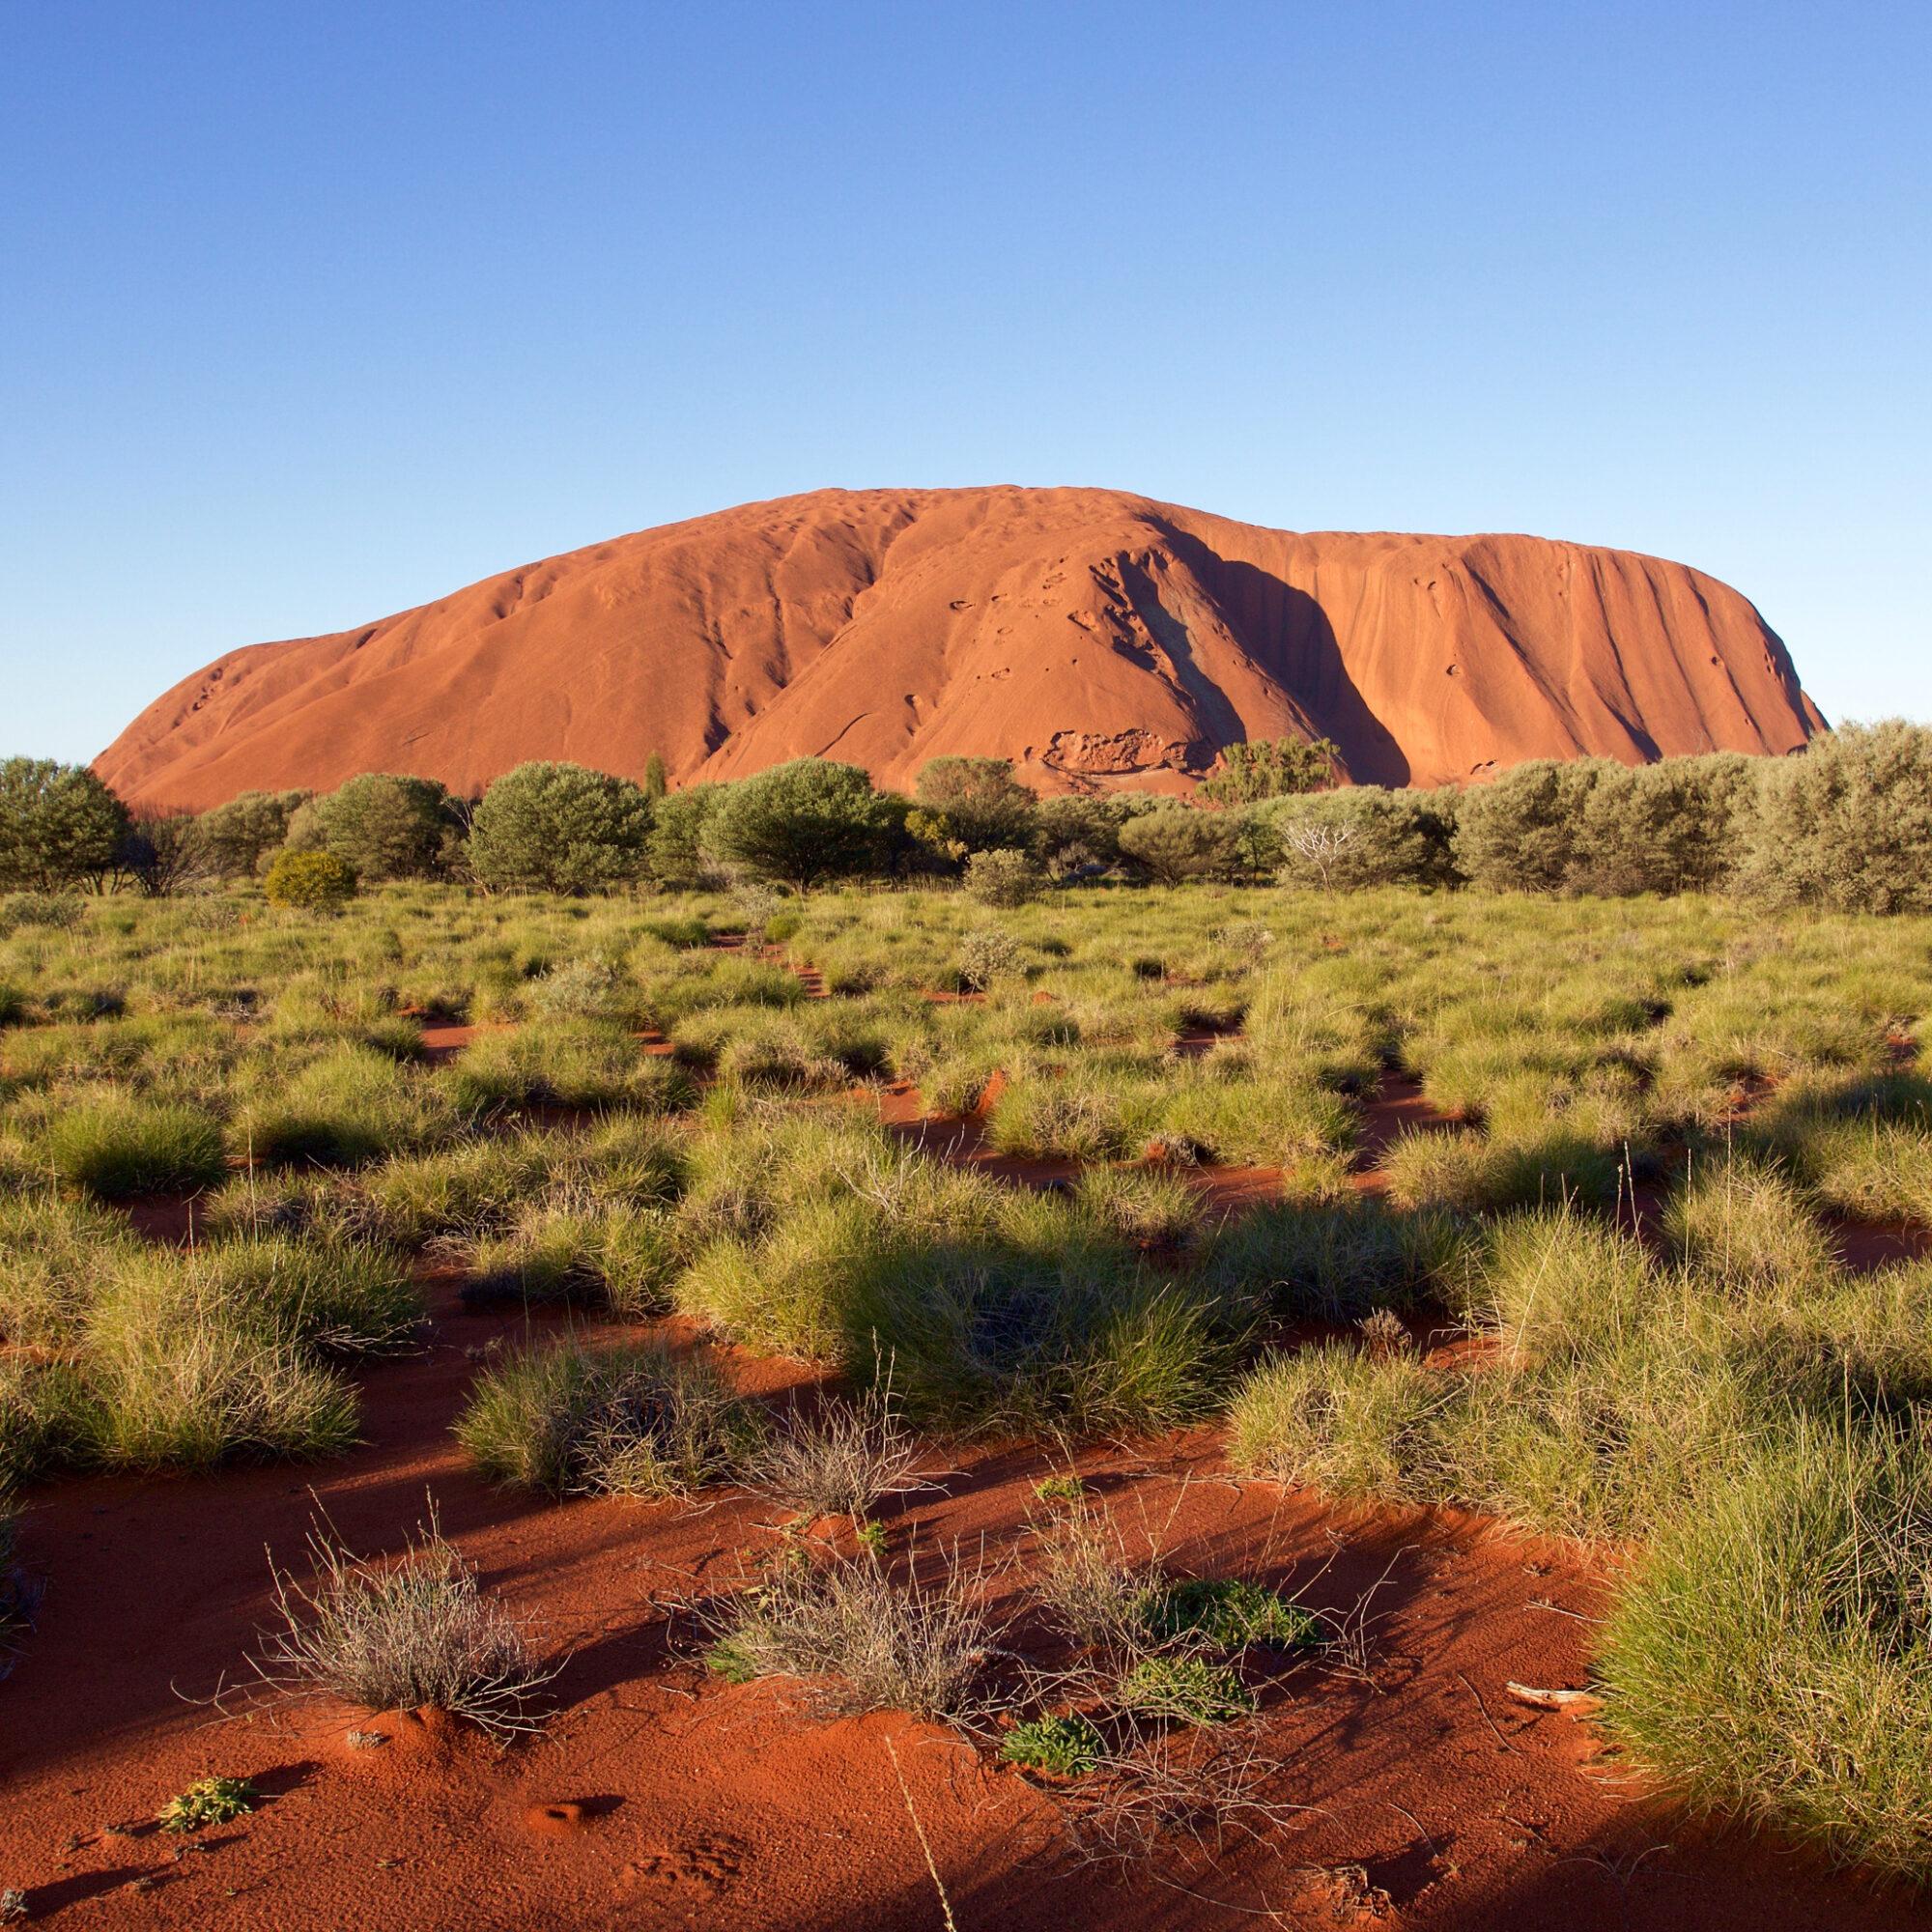 Uluru (previously Ayers Rock) in Australia.